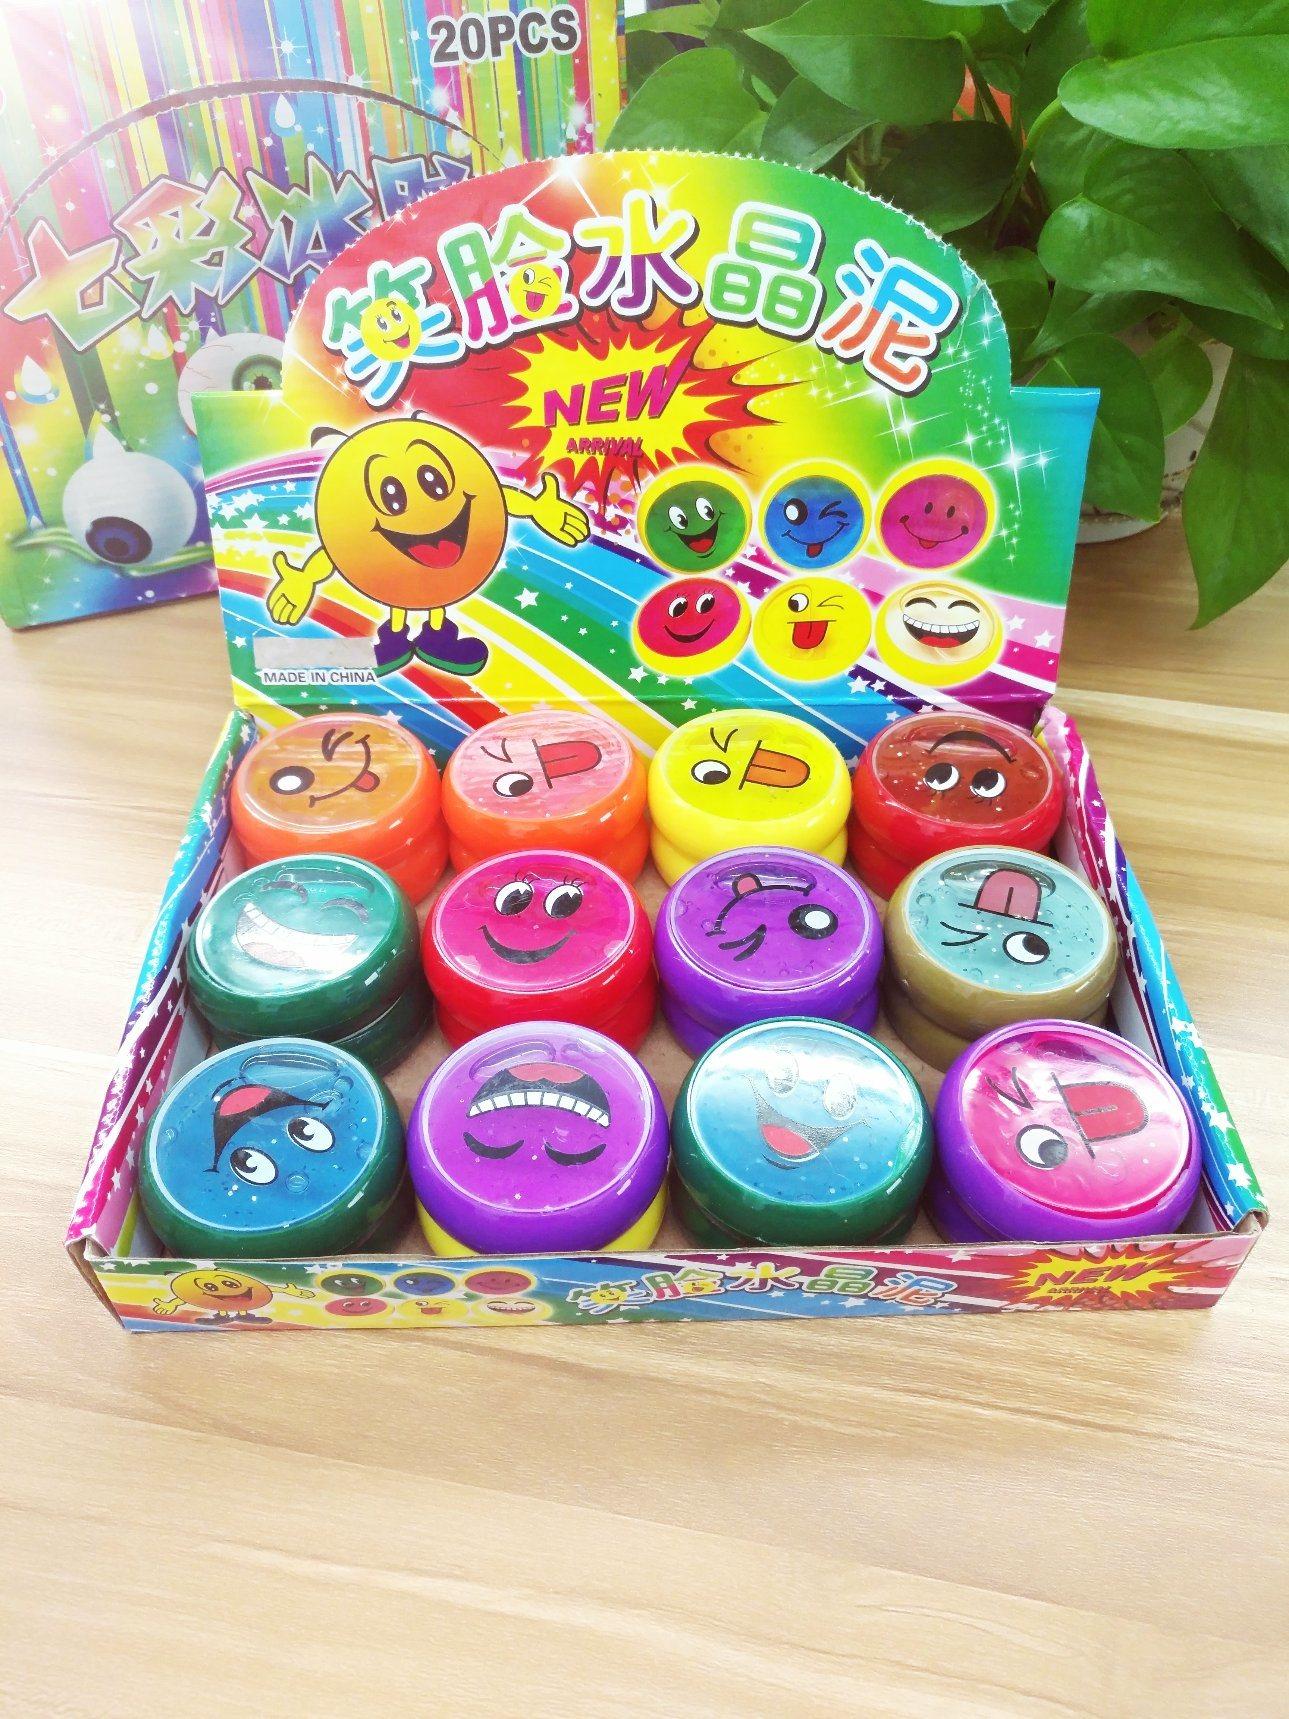 Toy Slime Slime for Kids Play Slime